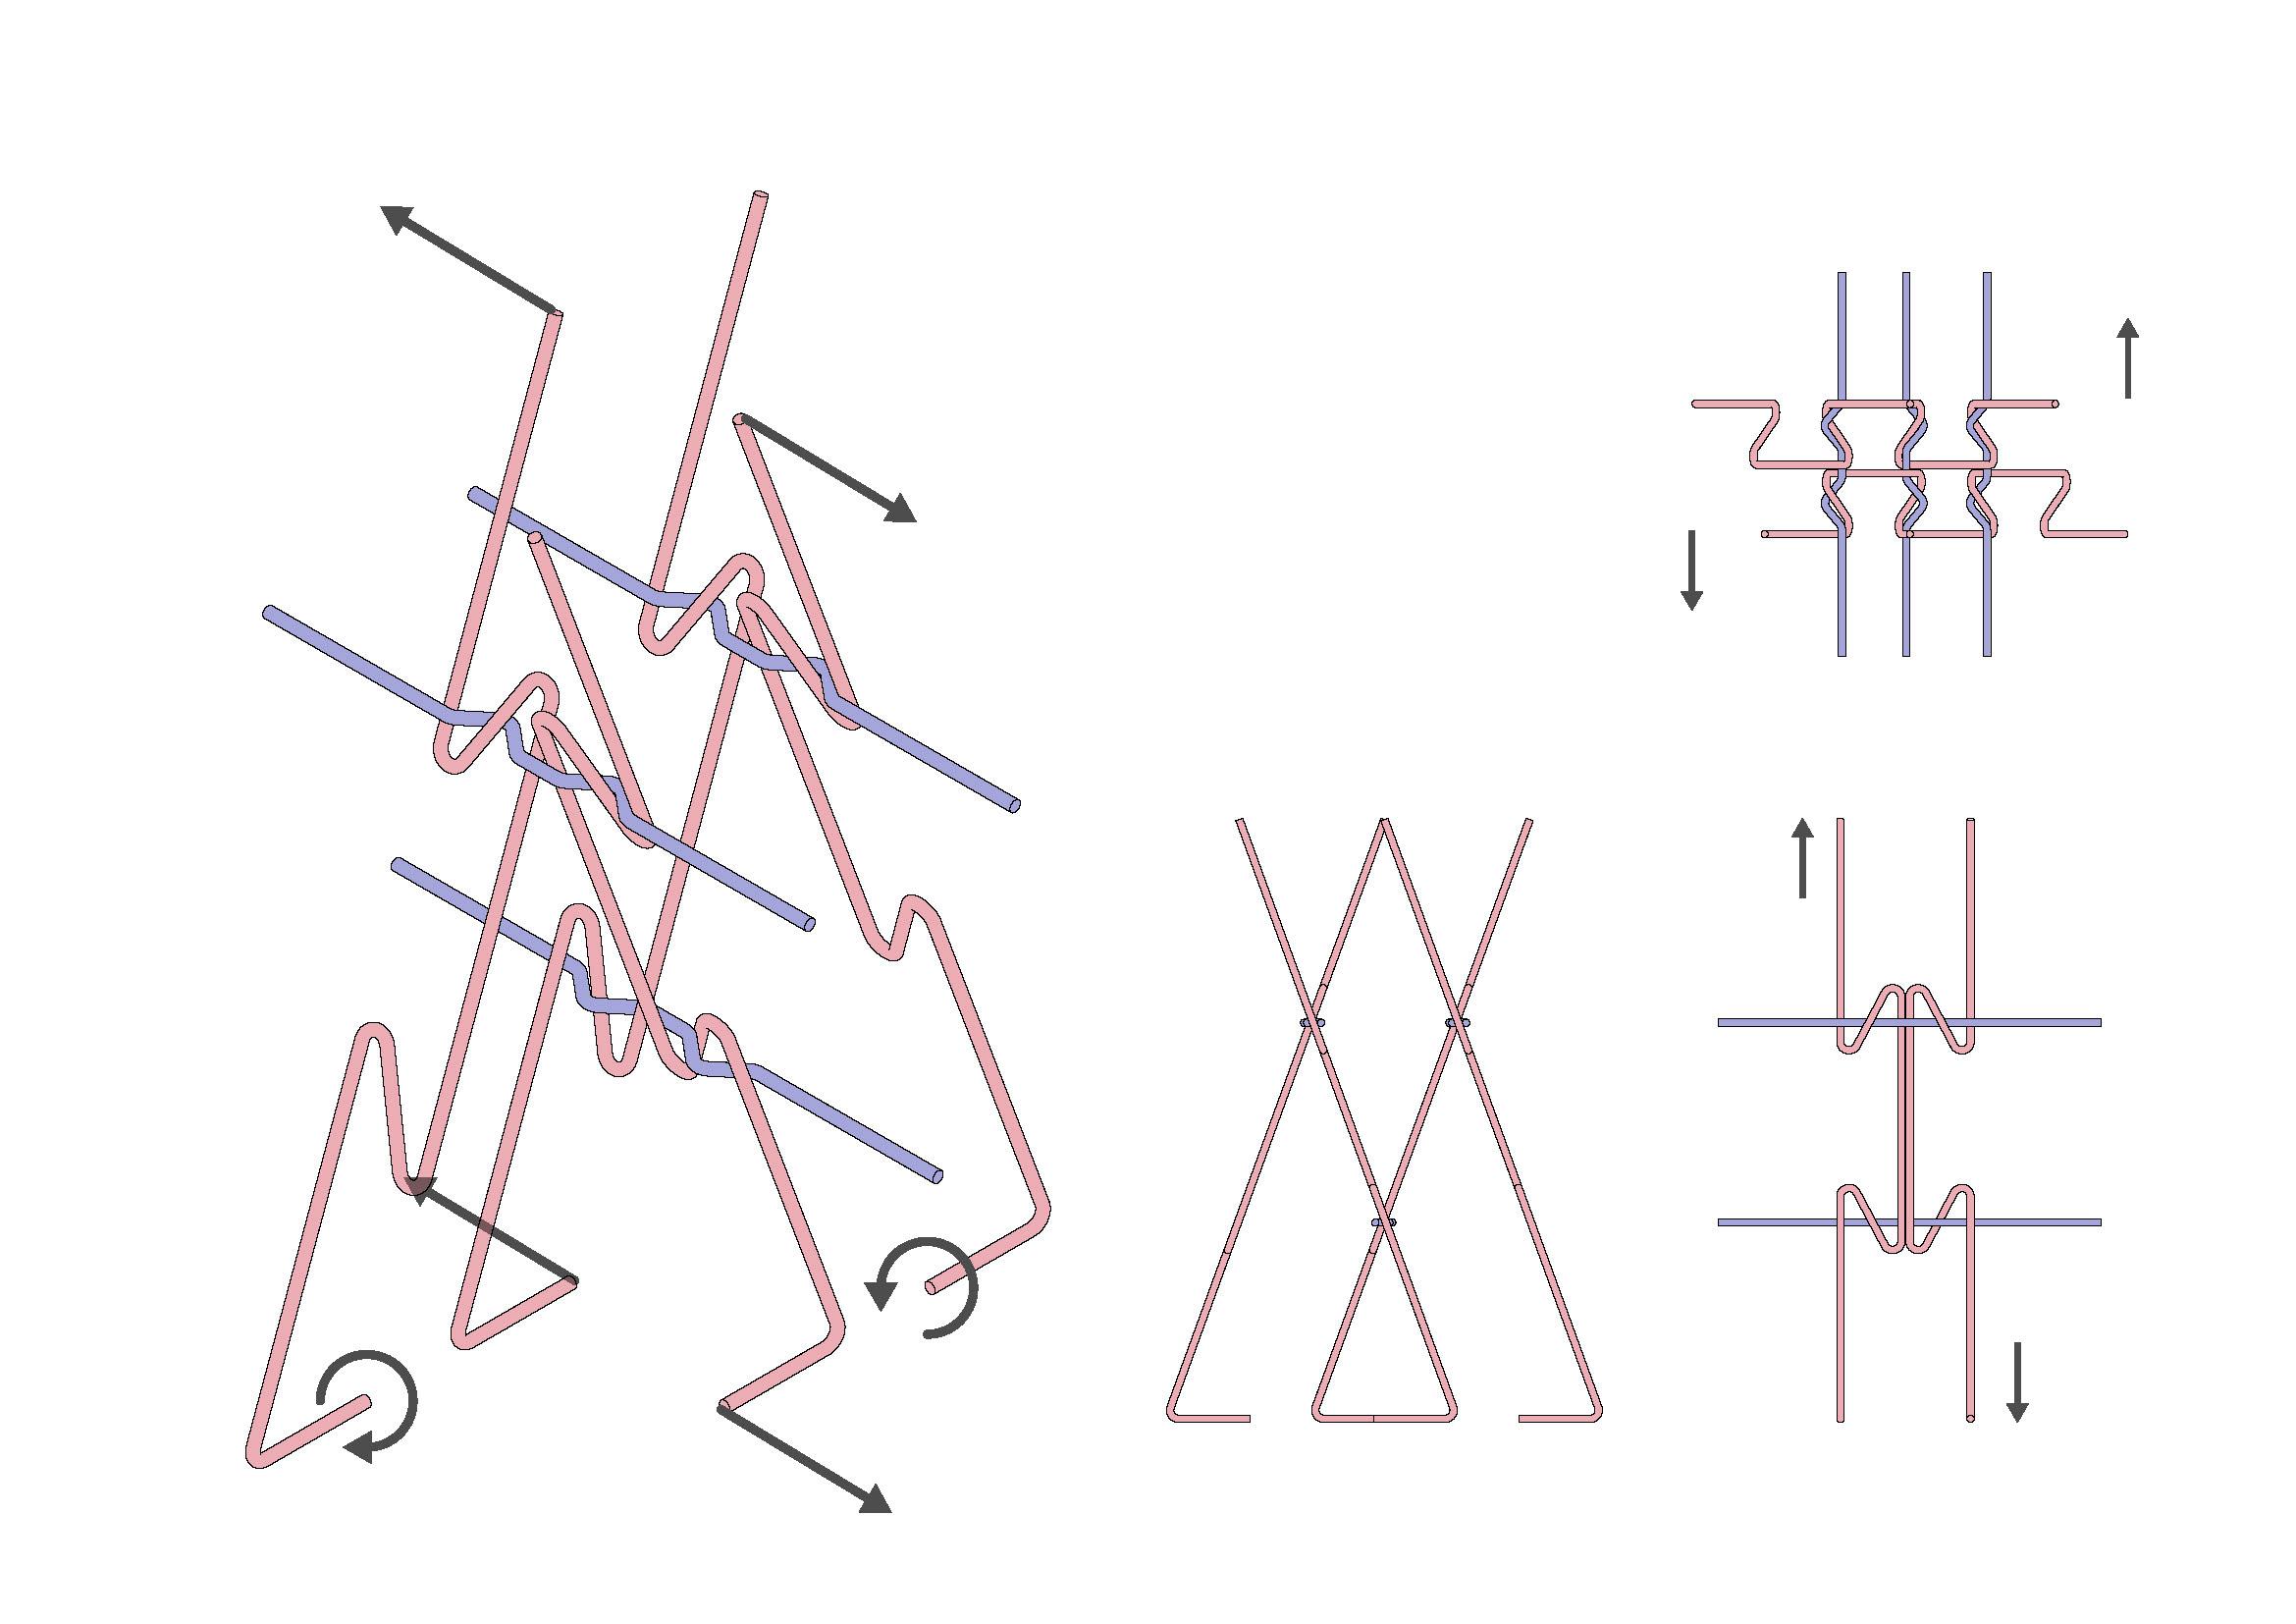 force diagram_for slides (1) 2.jpg